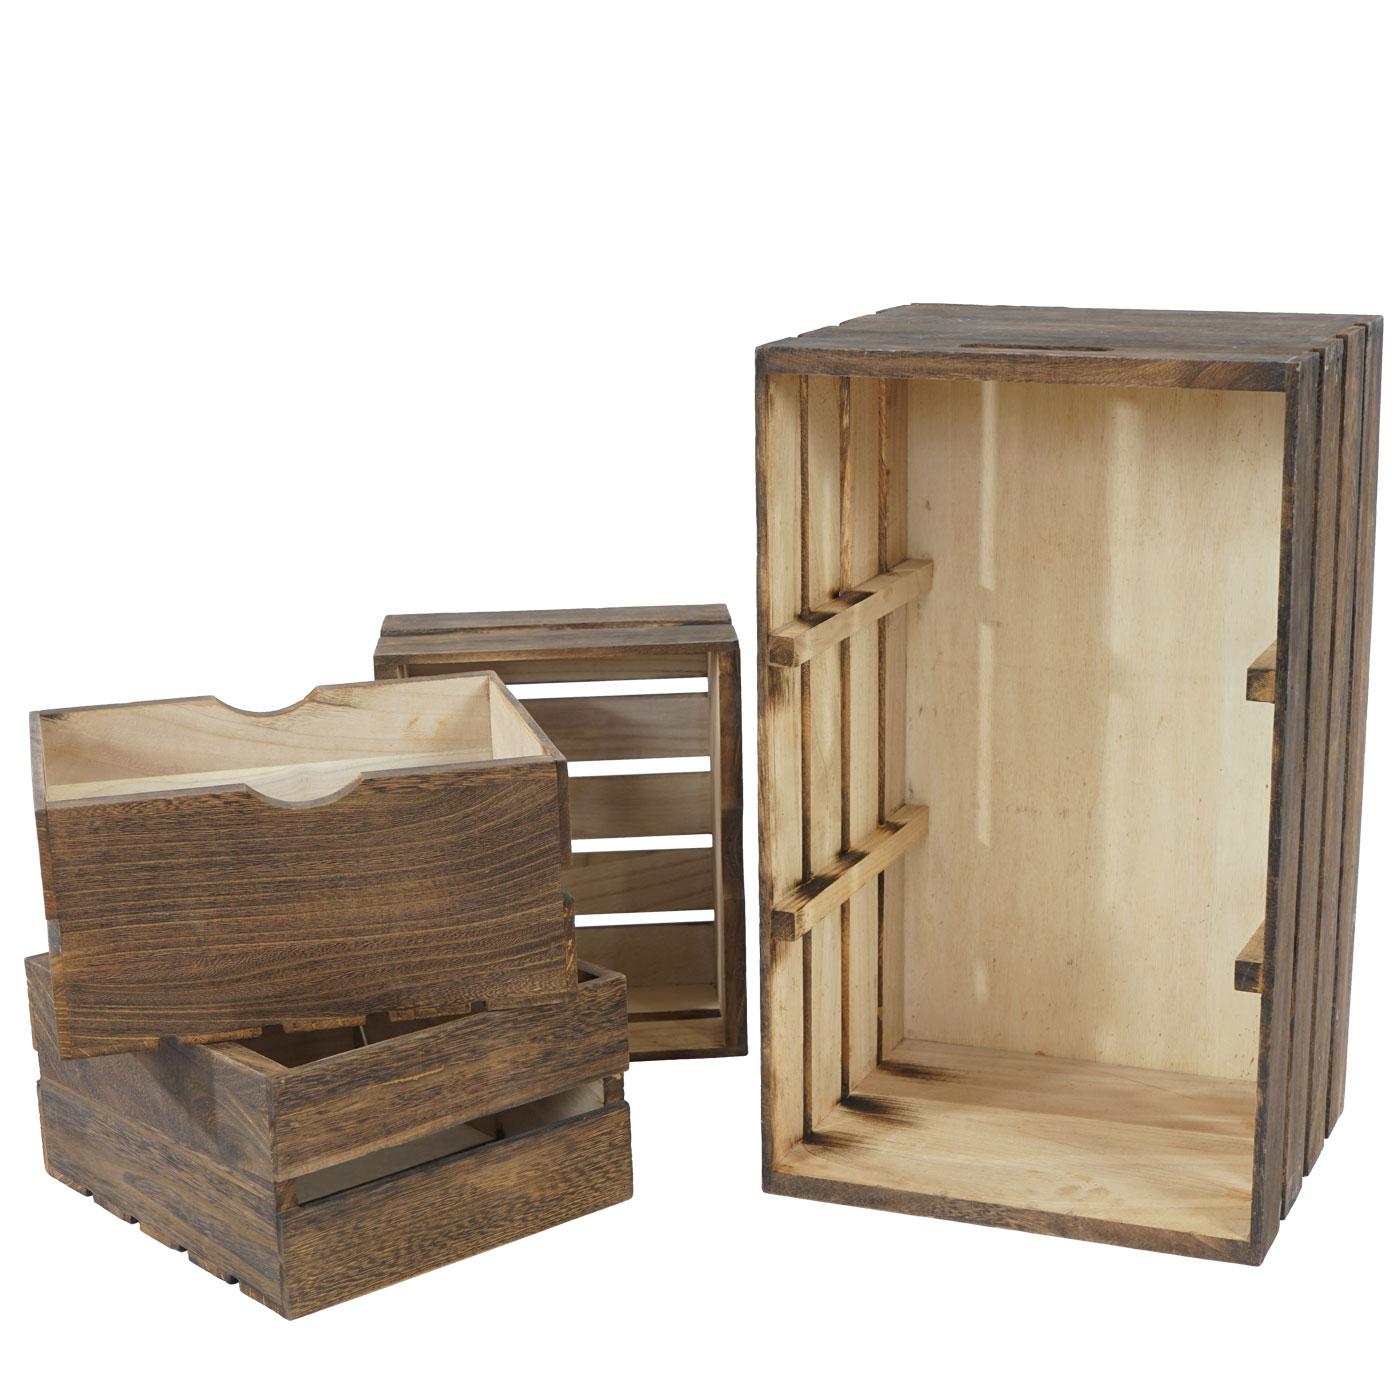 kommode tournai schubladenkommode holzkiste shabby look vintage 53x31x26cm braun. Black Bedroom Furniture Sets. Home Design Ideas